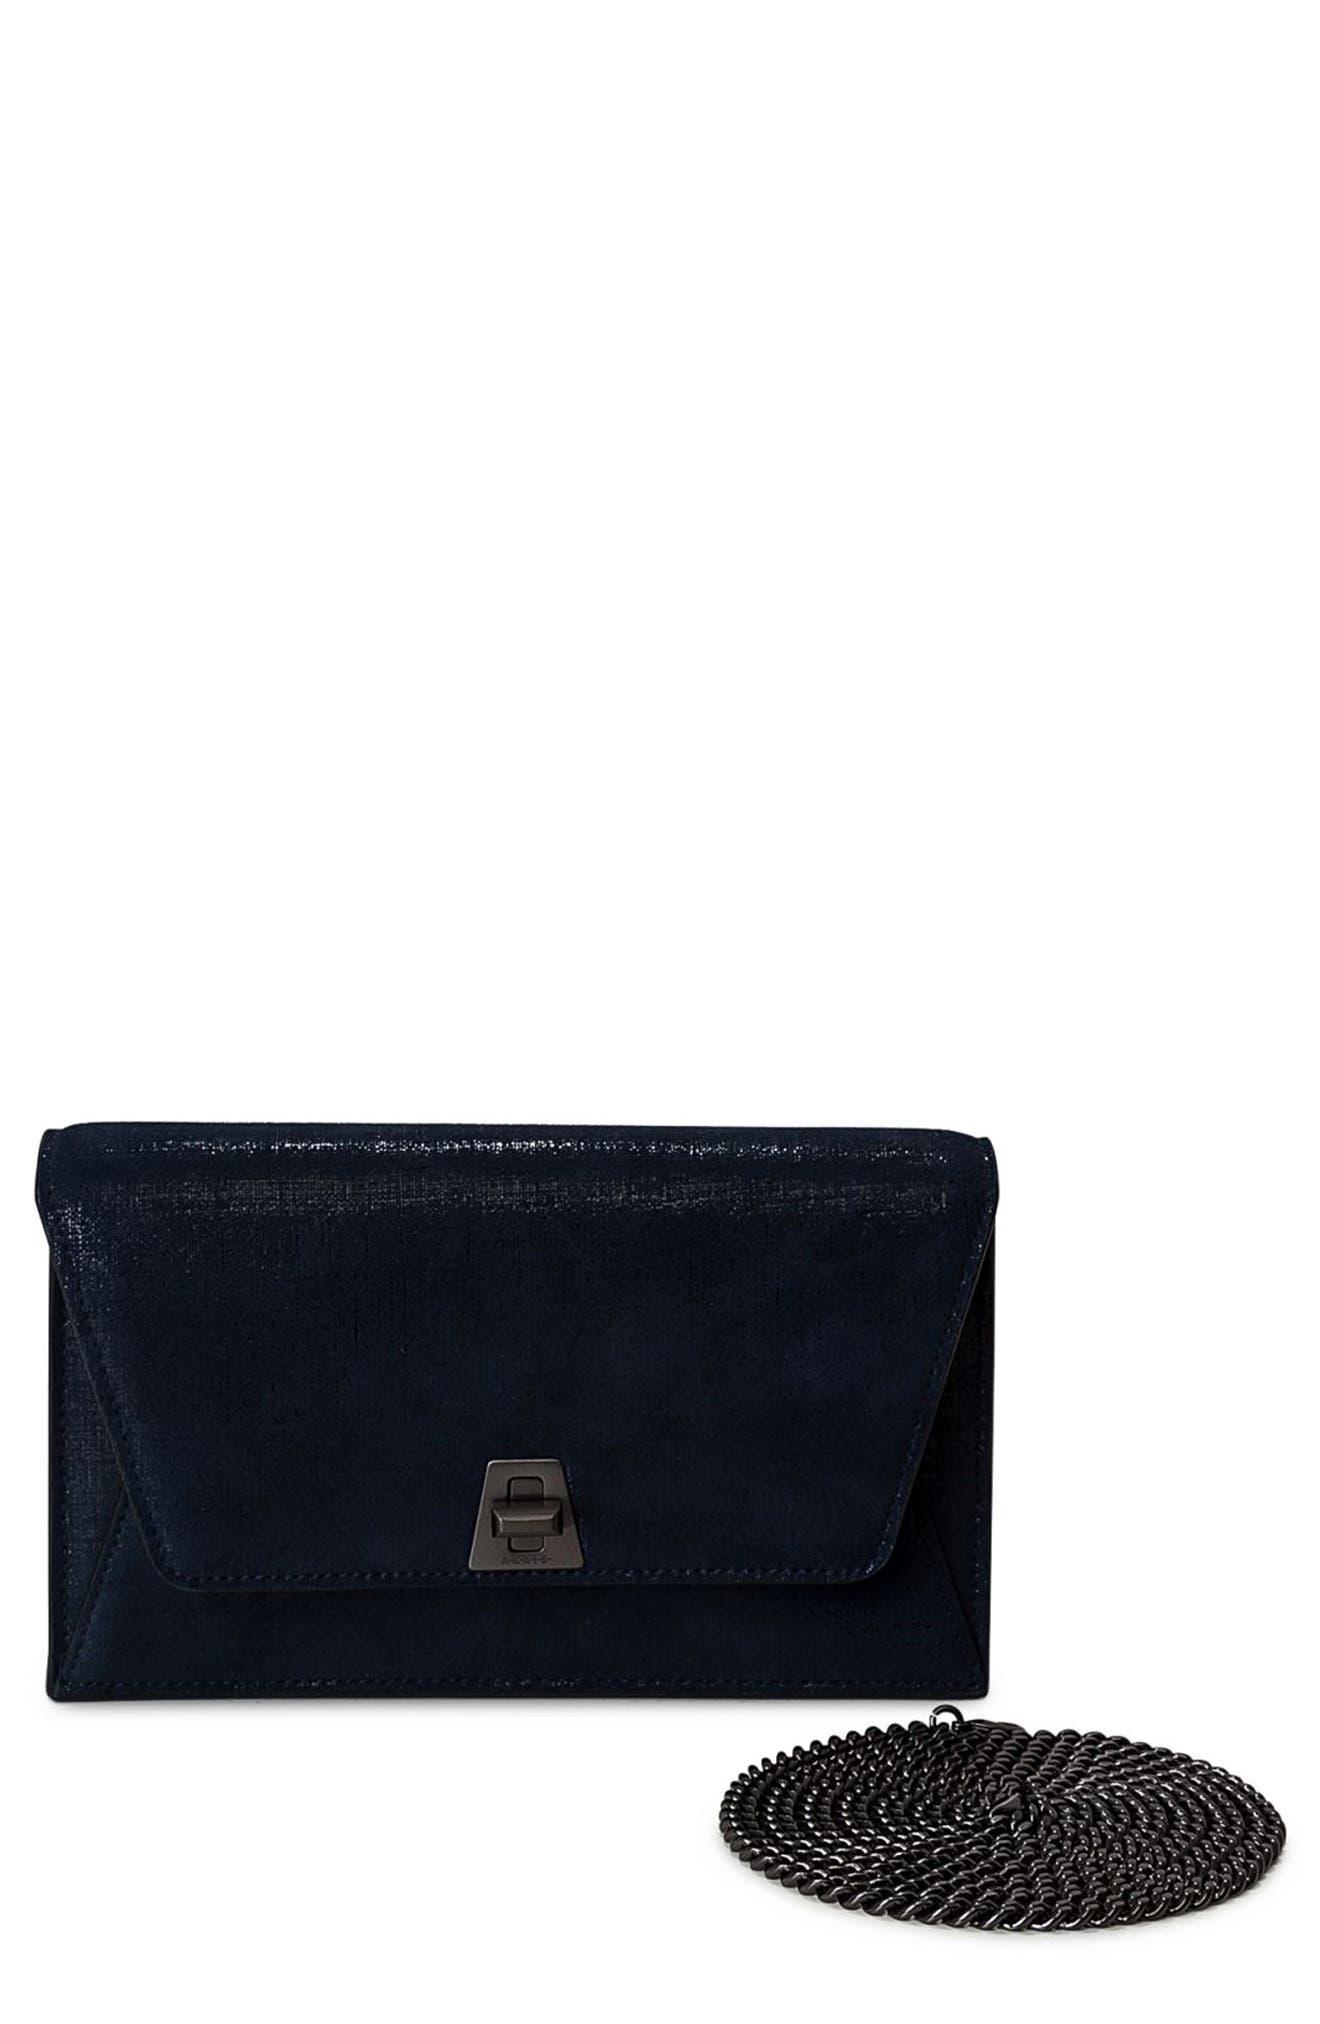 Anouk Leather Shoulder Bag,                         Main,                         color,